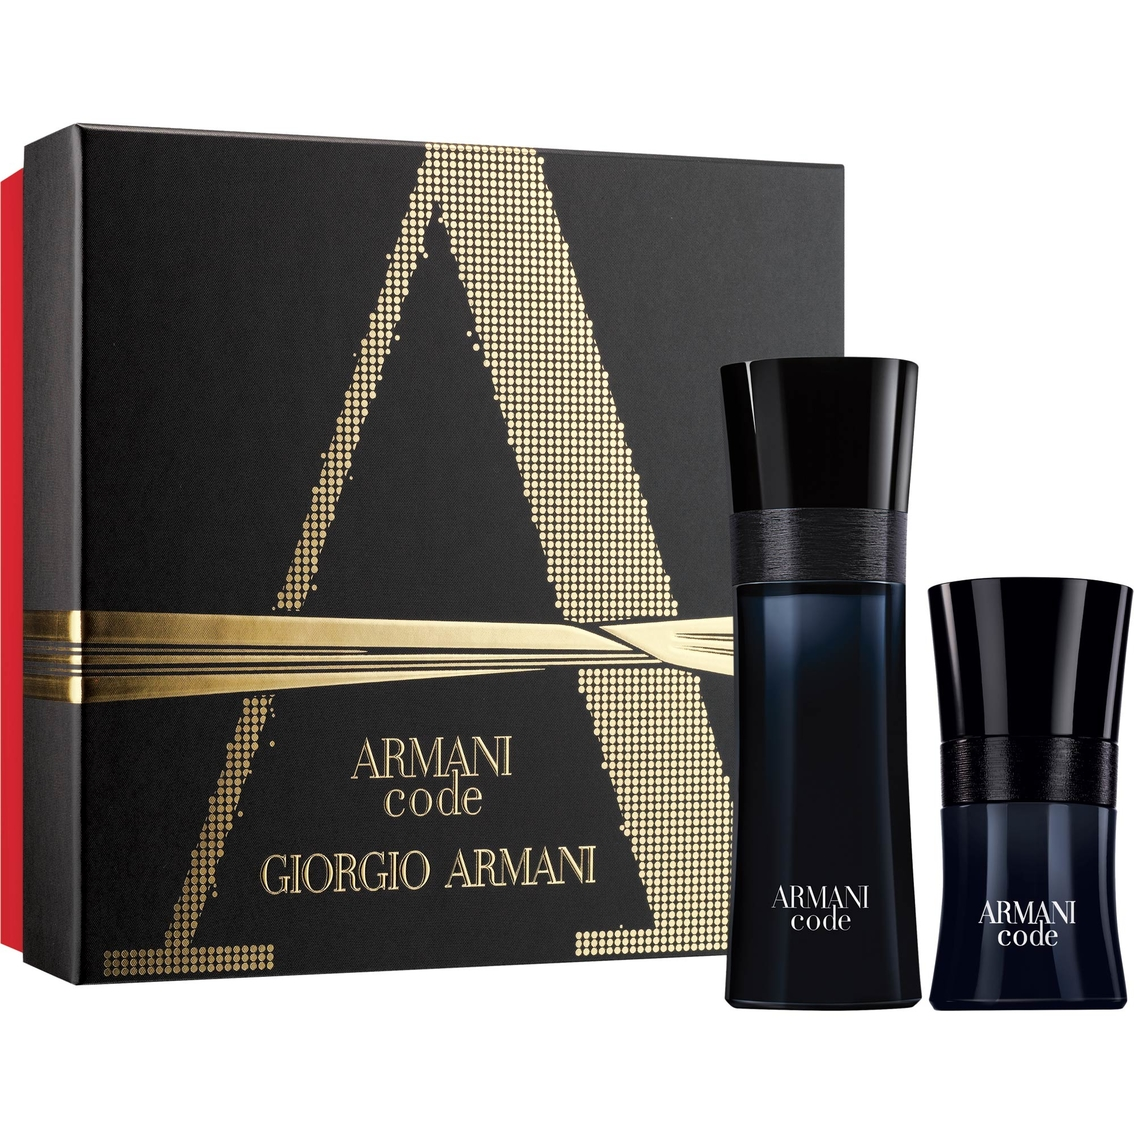 72a27e06b1e7 Giorgio Armani Code For Men 2 Pc. Gift Set